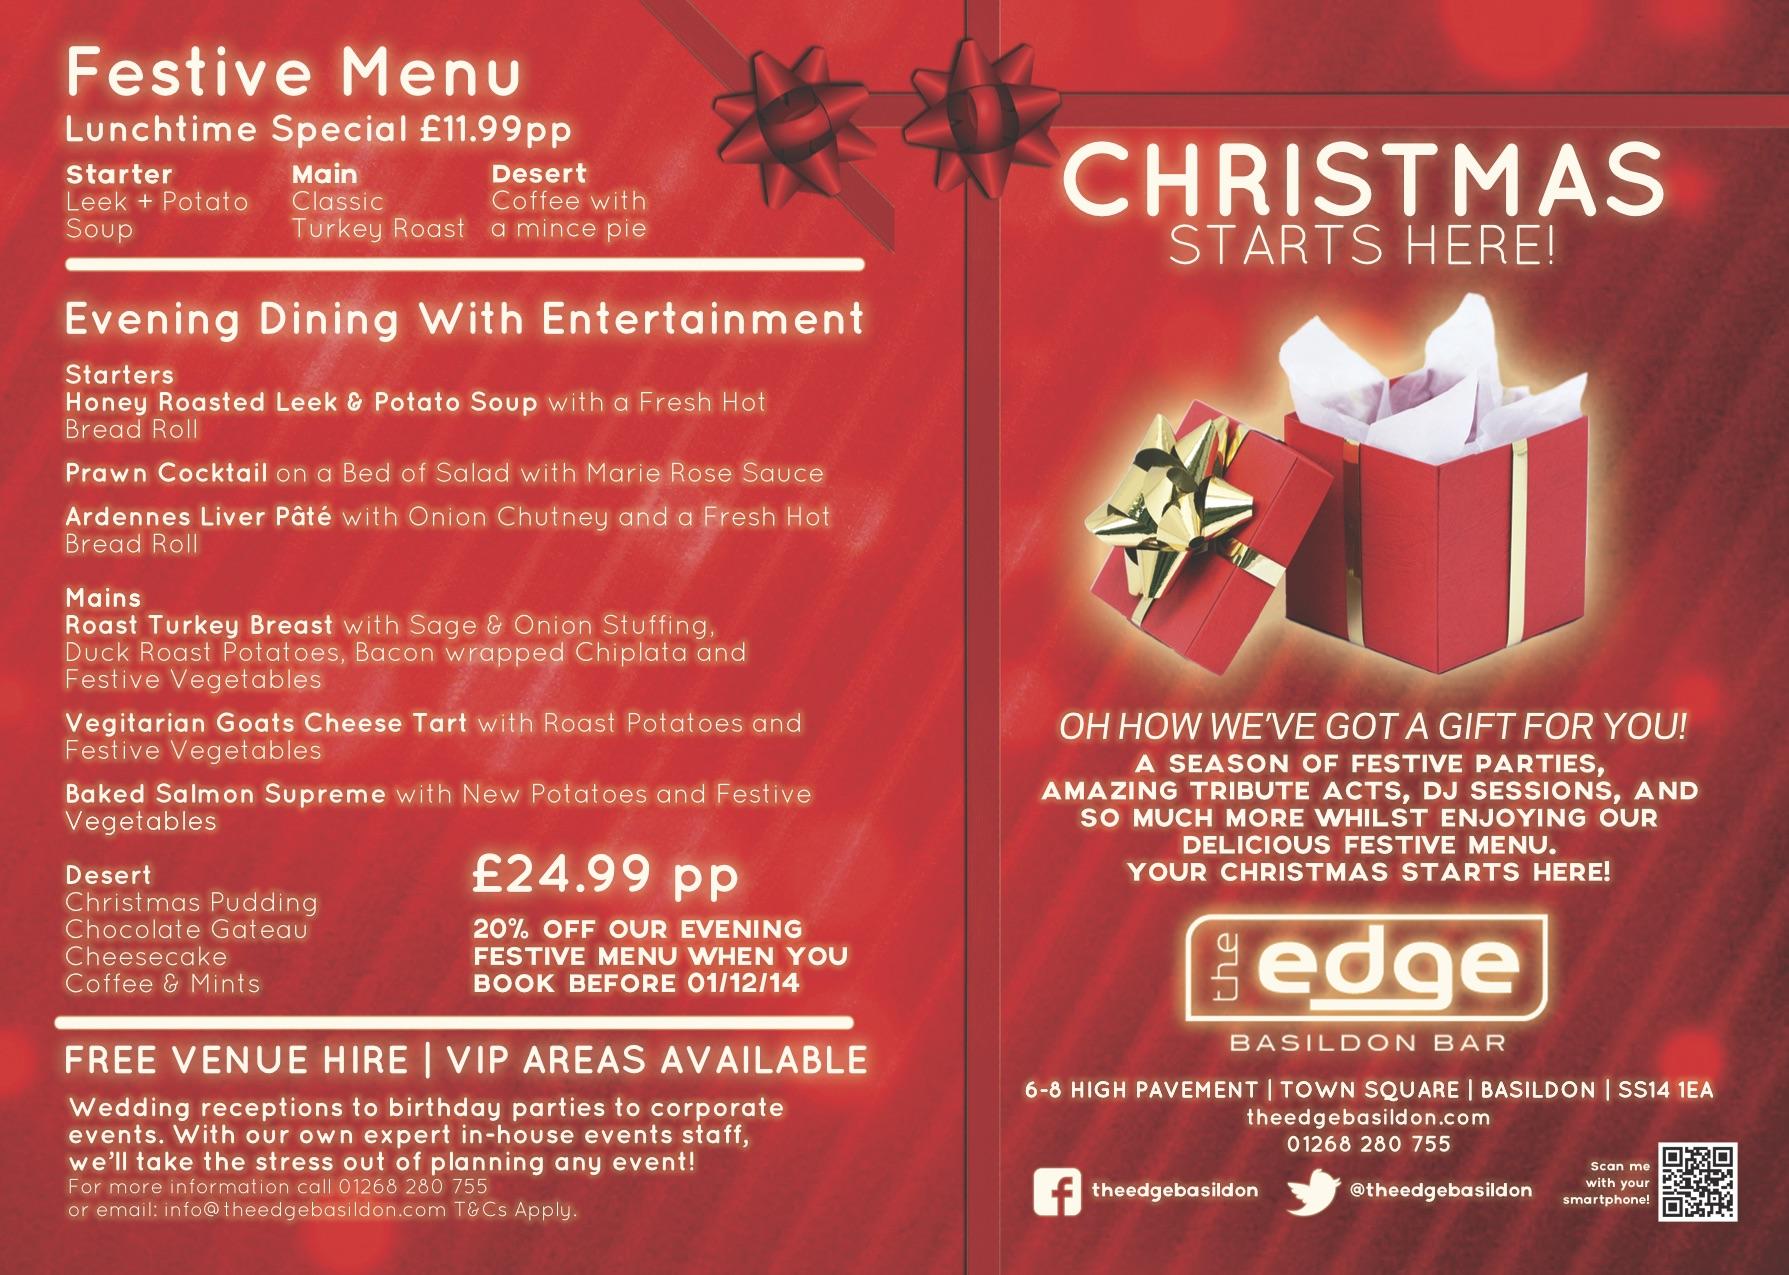 Xmas Events 14 The Edge Basildon Bar With Live Music Djs And